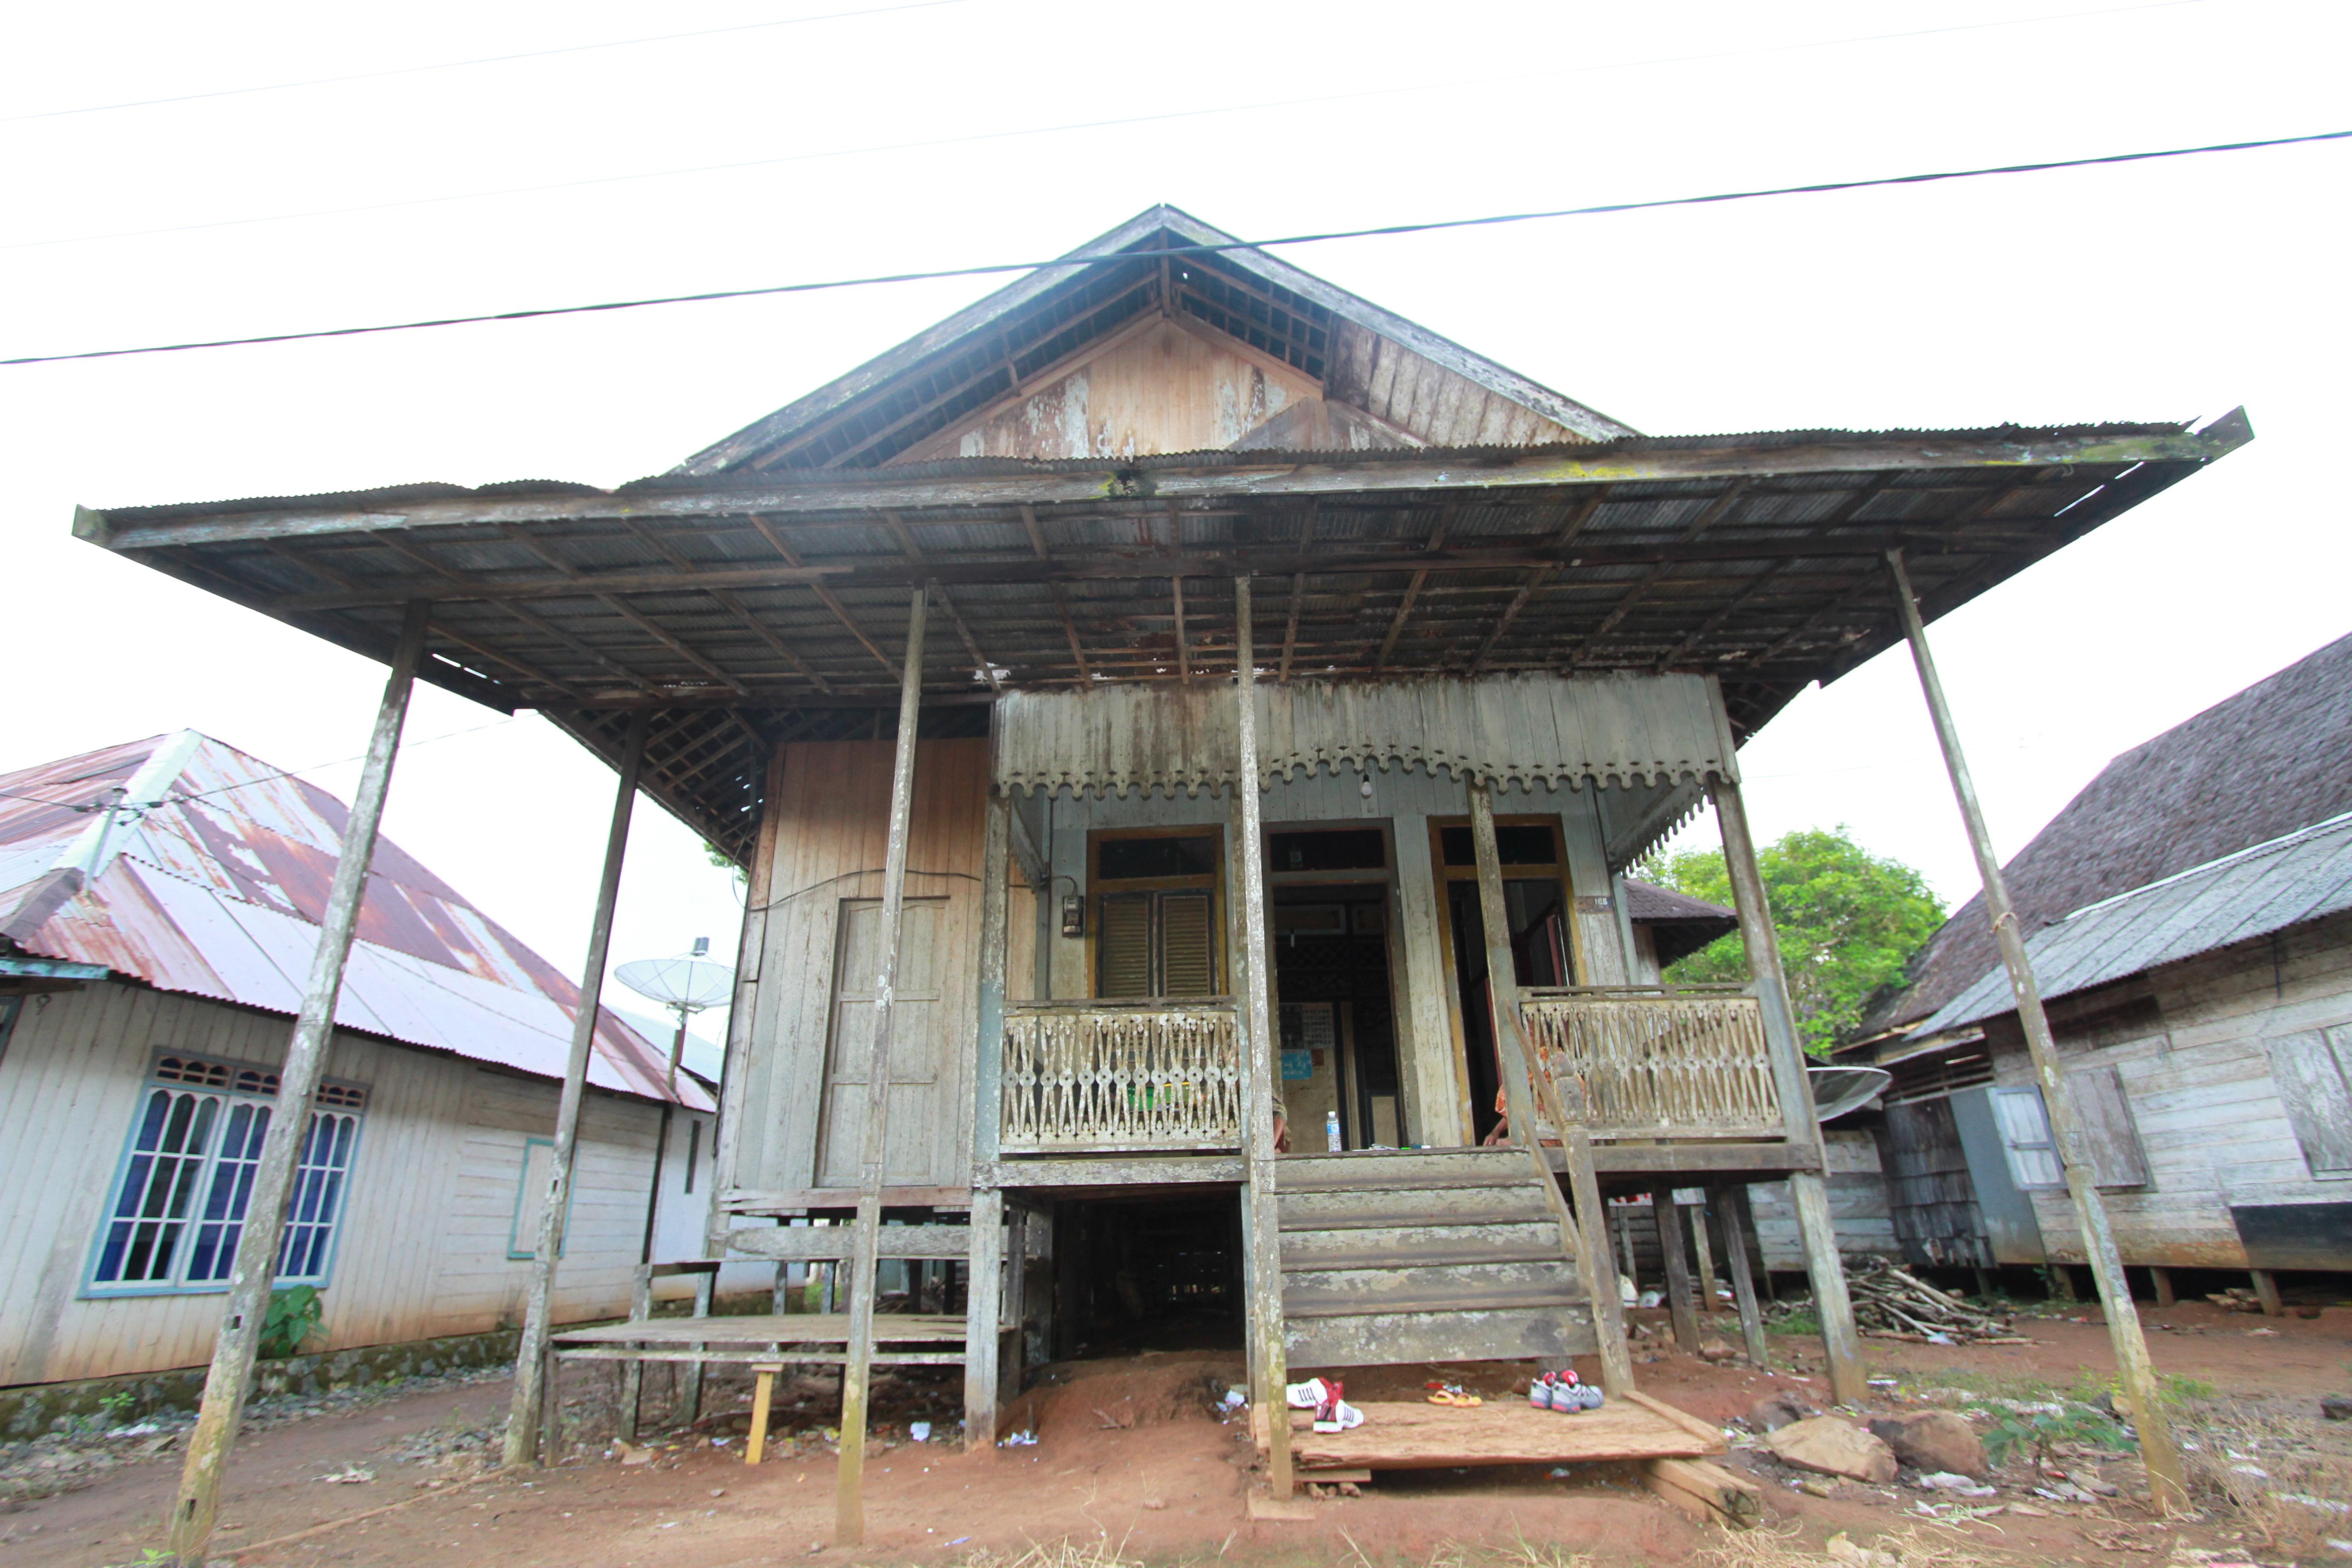 Mengenal Rumah Tradisional Banjar